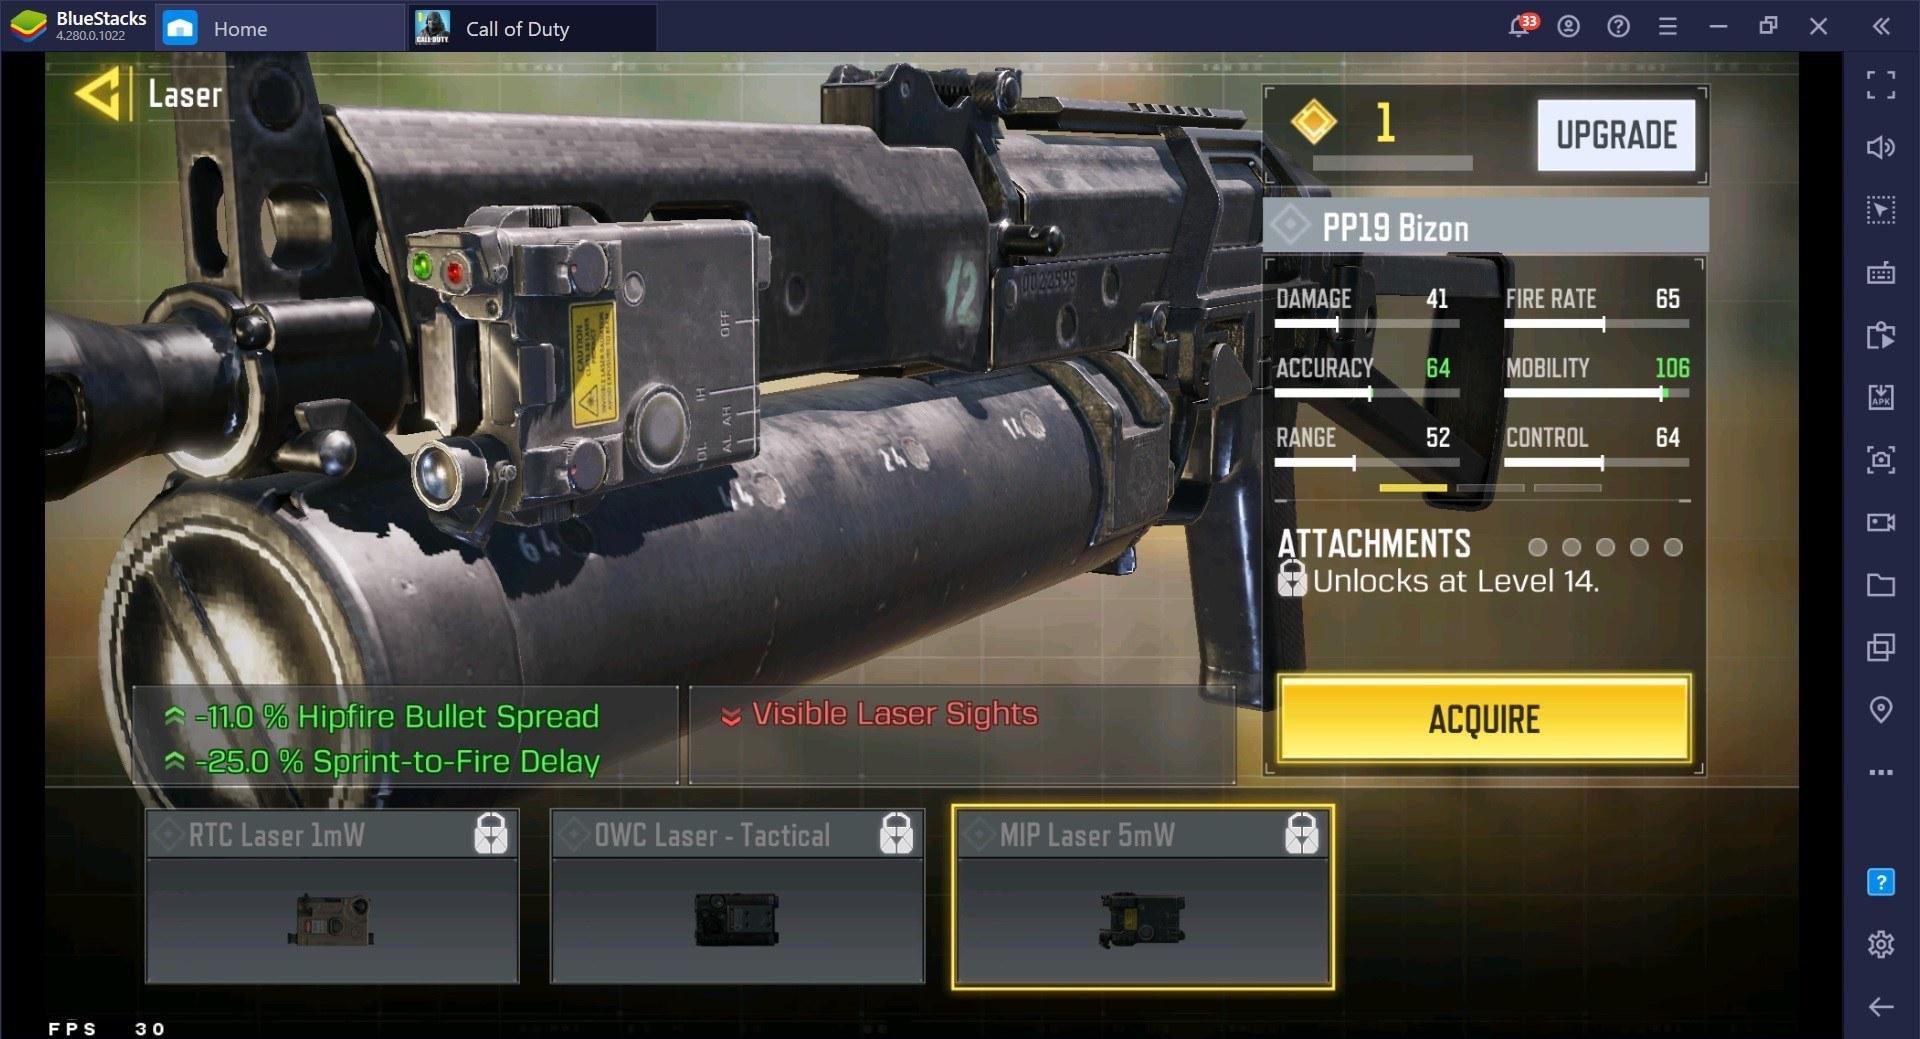 Call of Duty: Mobile Season 3 PP19 Bizon Gunsmith and Loadout Guide